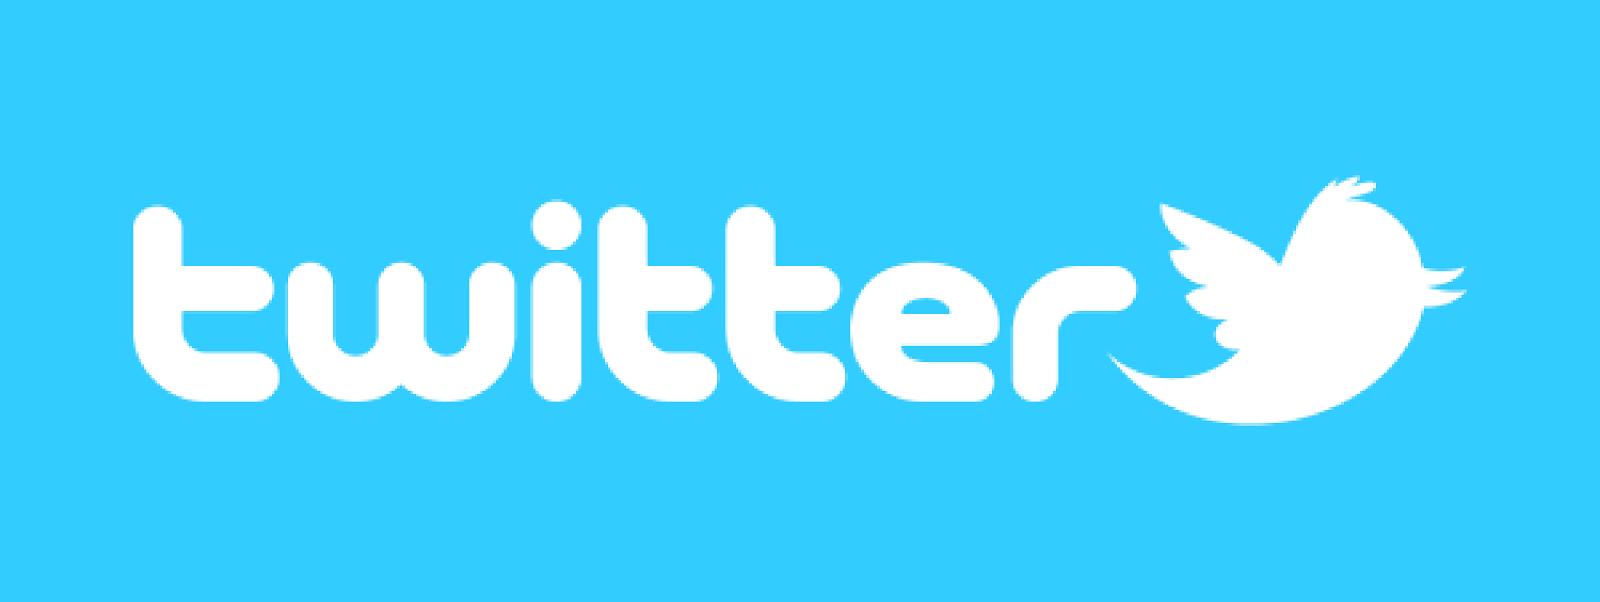 Visit Me at Twitter